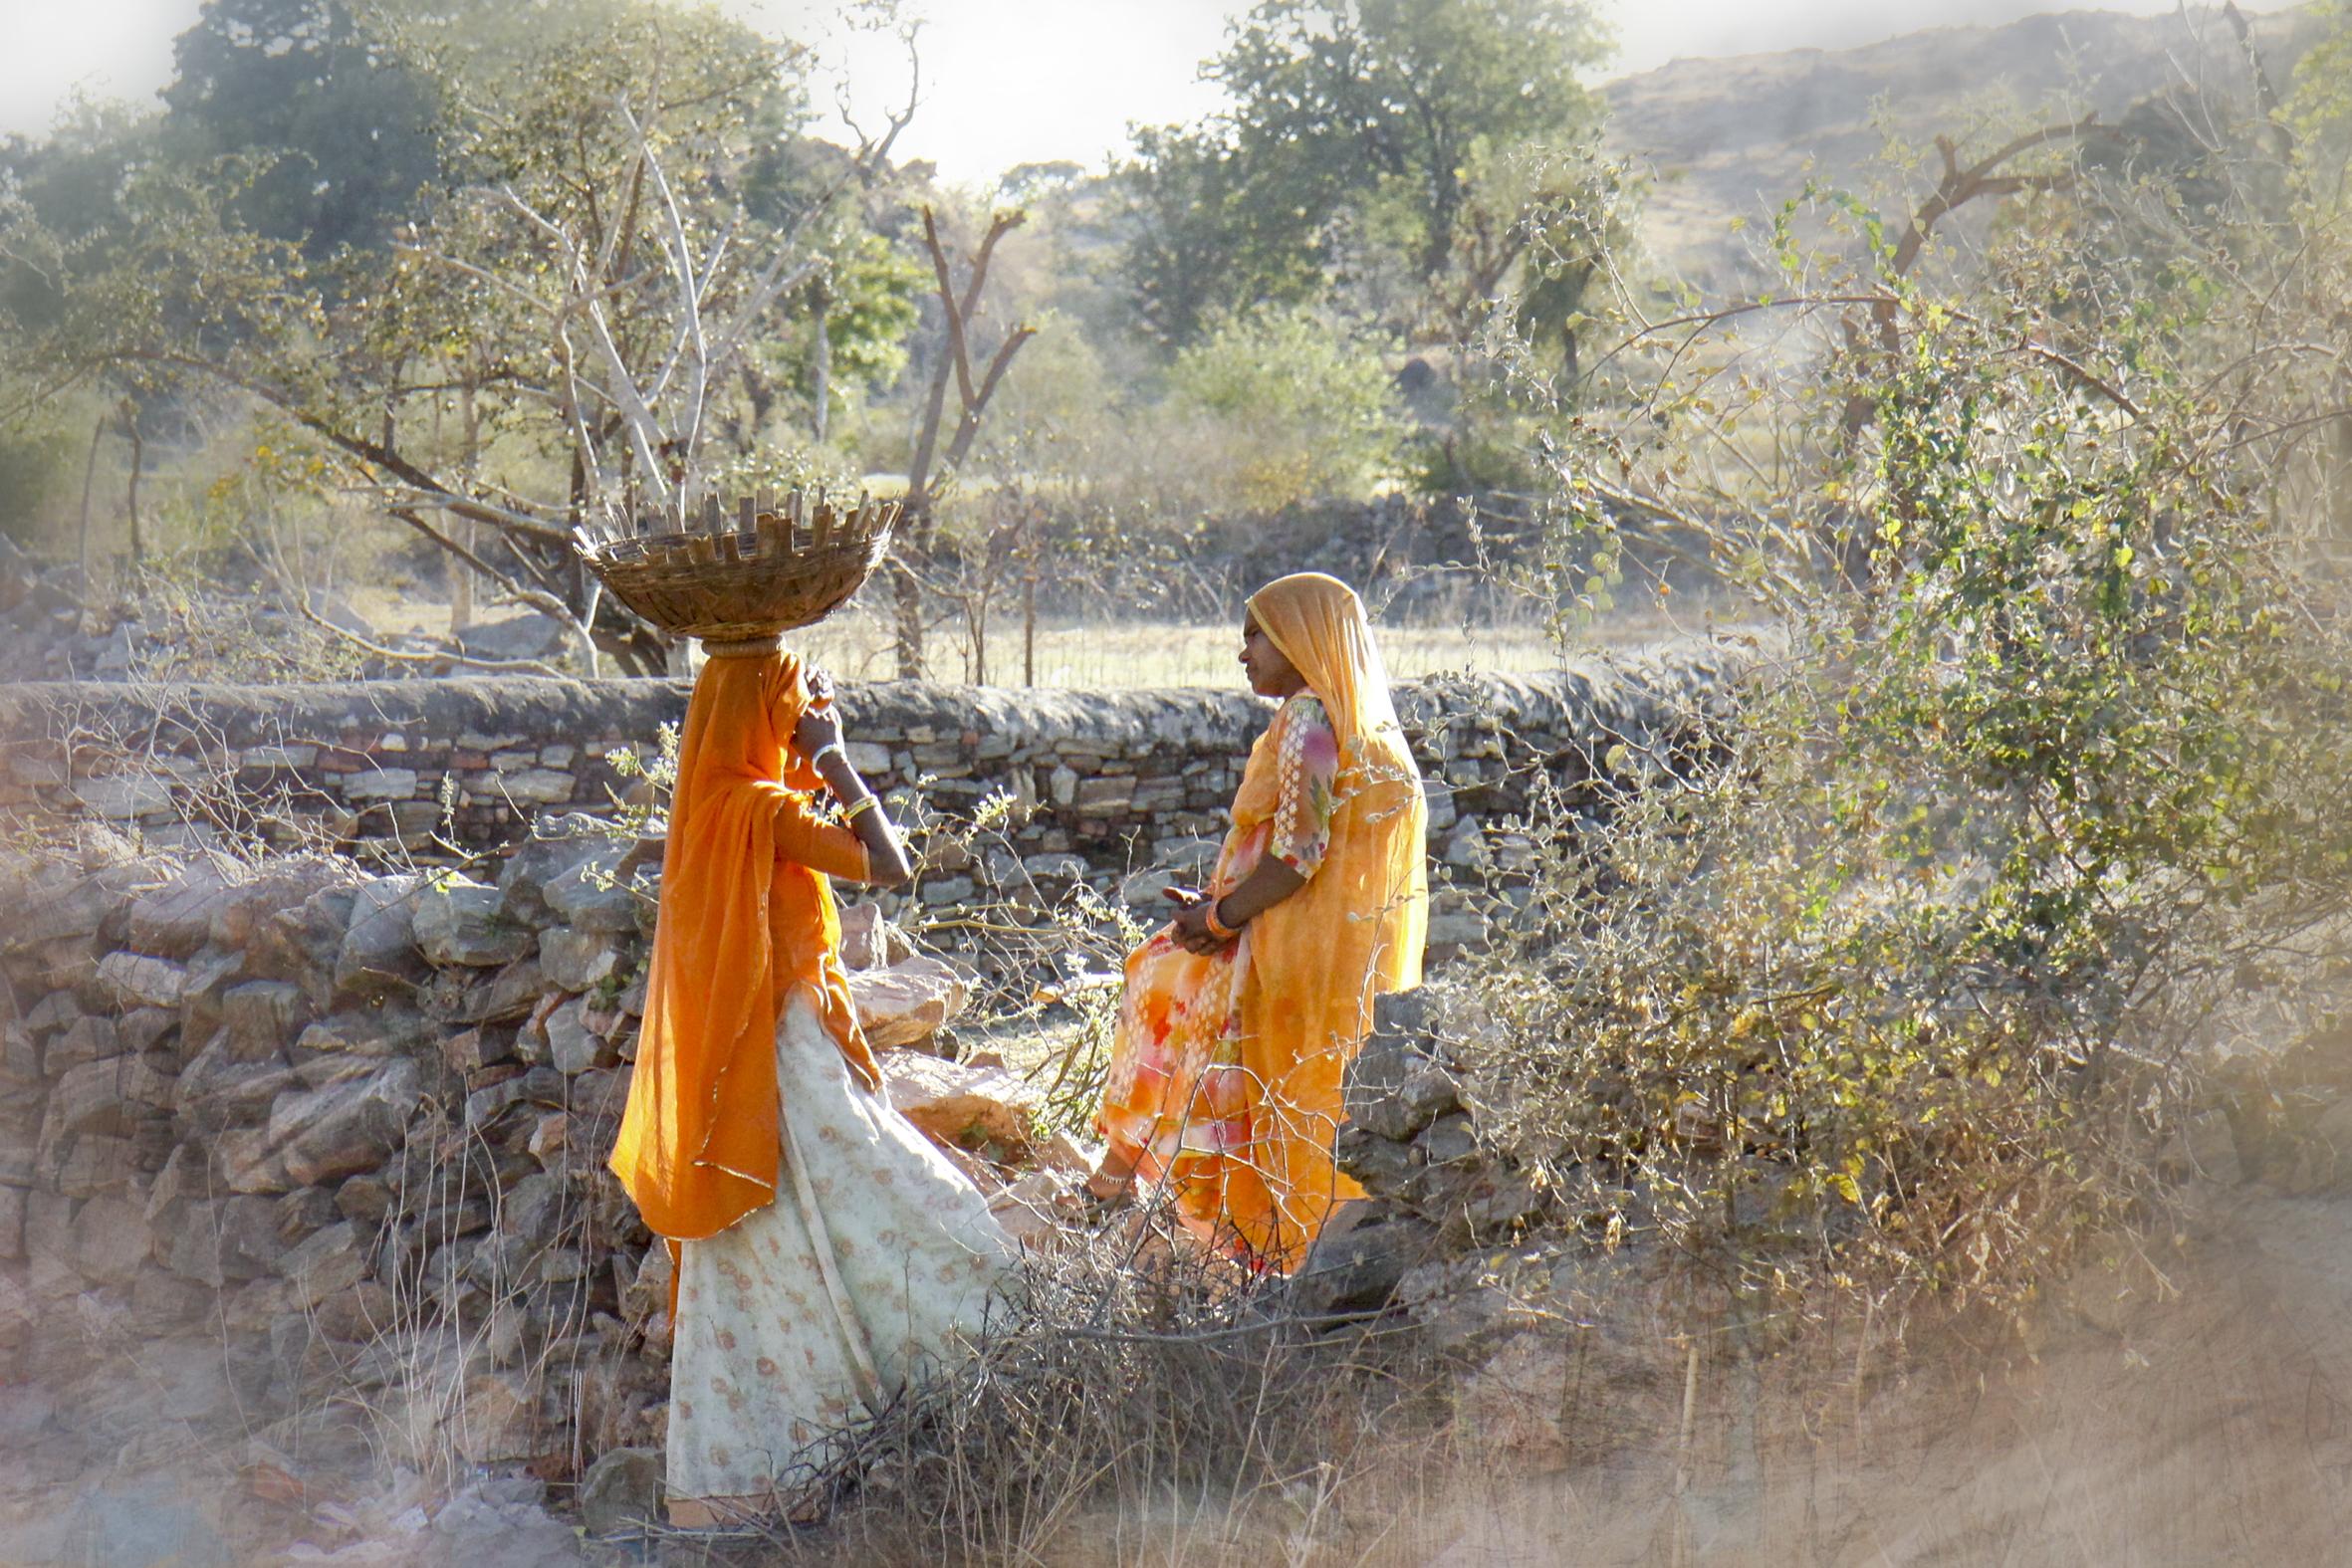 portraits-indien-inde-rajasthan-2010-marie-colette-becker-15